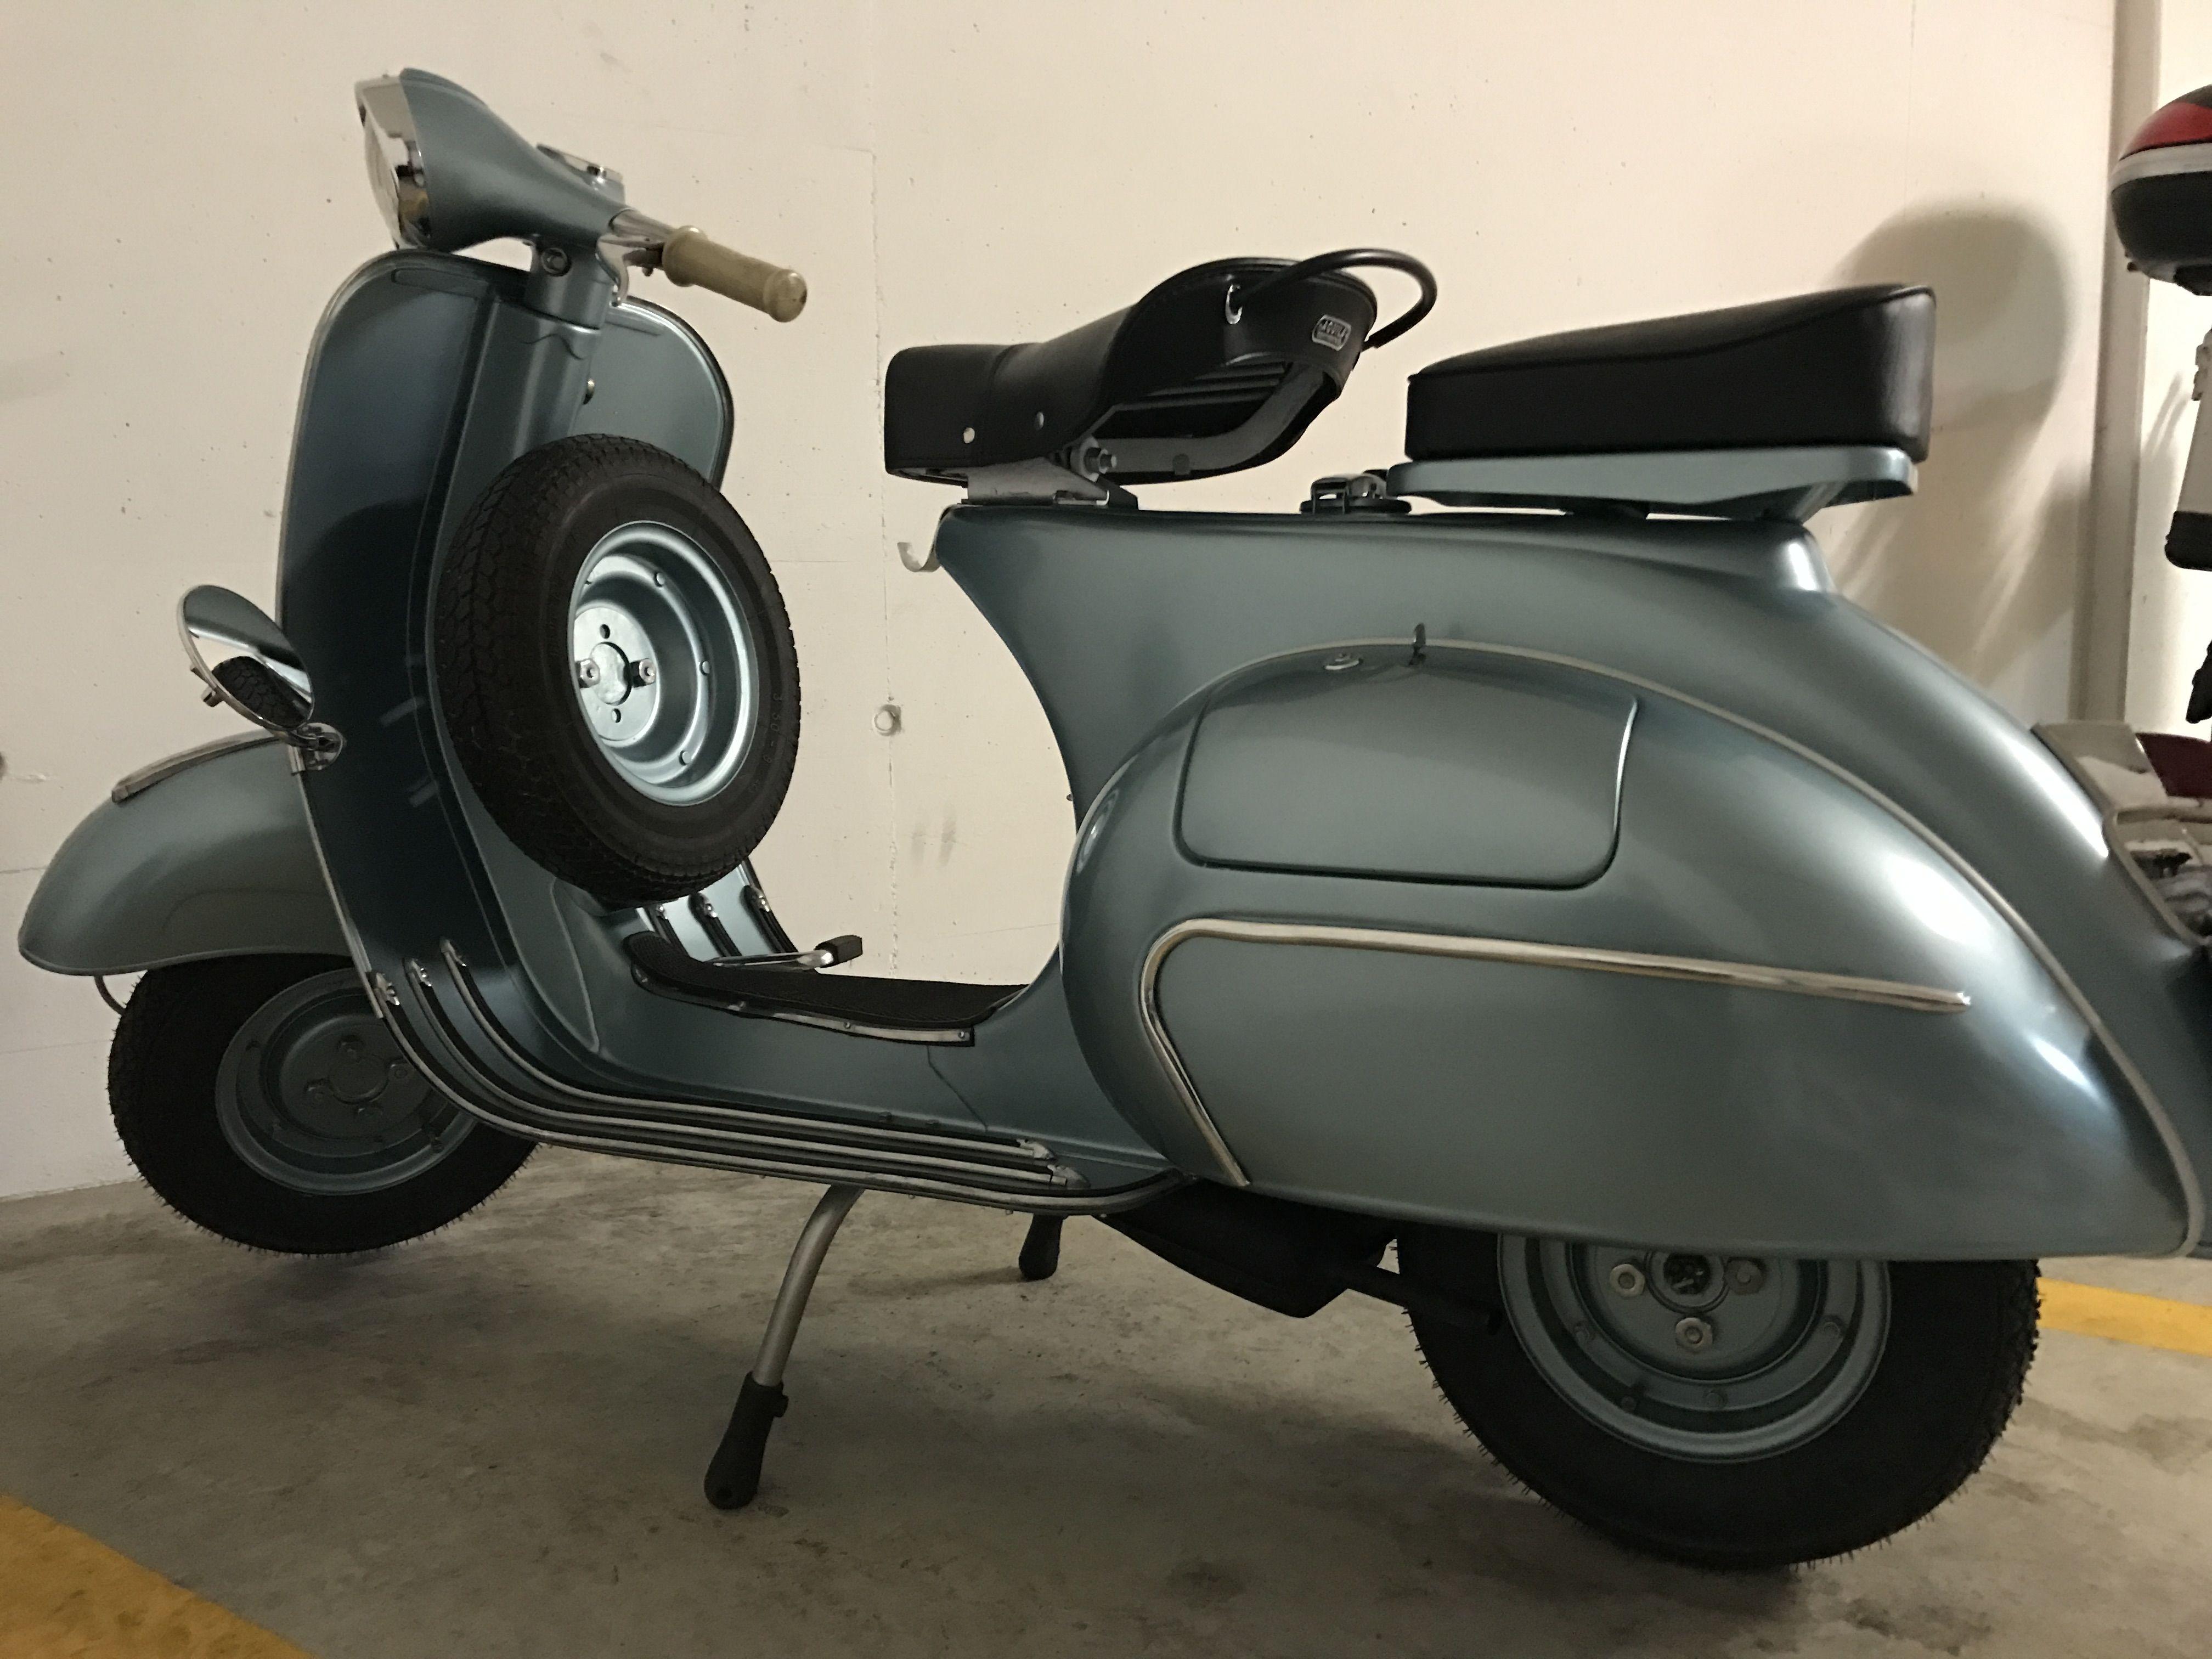 vespa vbb1t 150 1962 vespa rally pinterest vespa. Black Bedroom Furniture Sets. Home Design Ideas